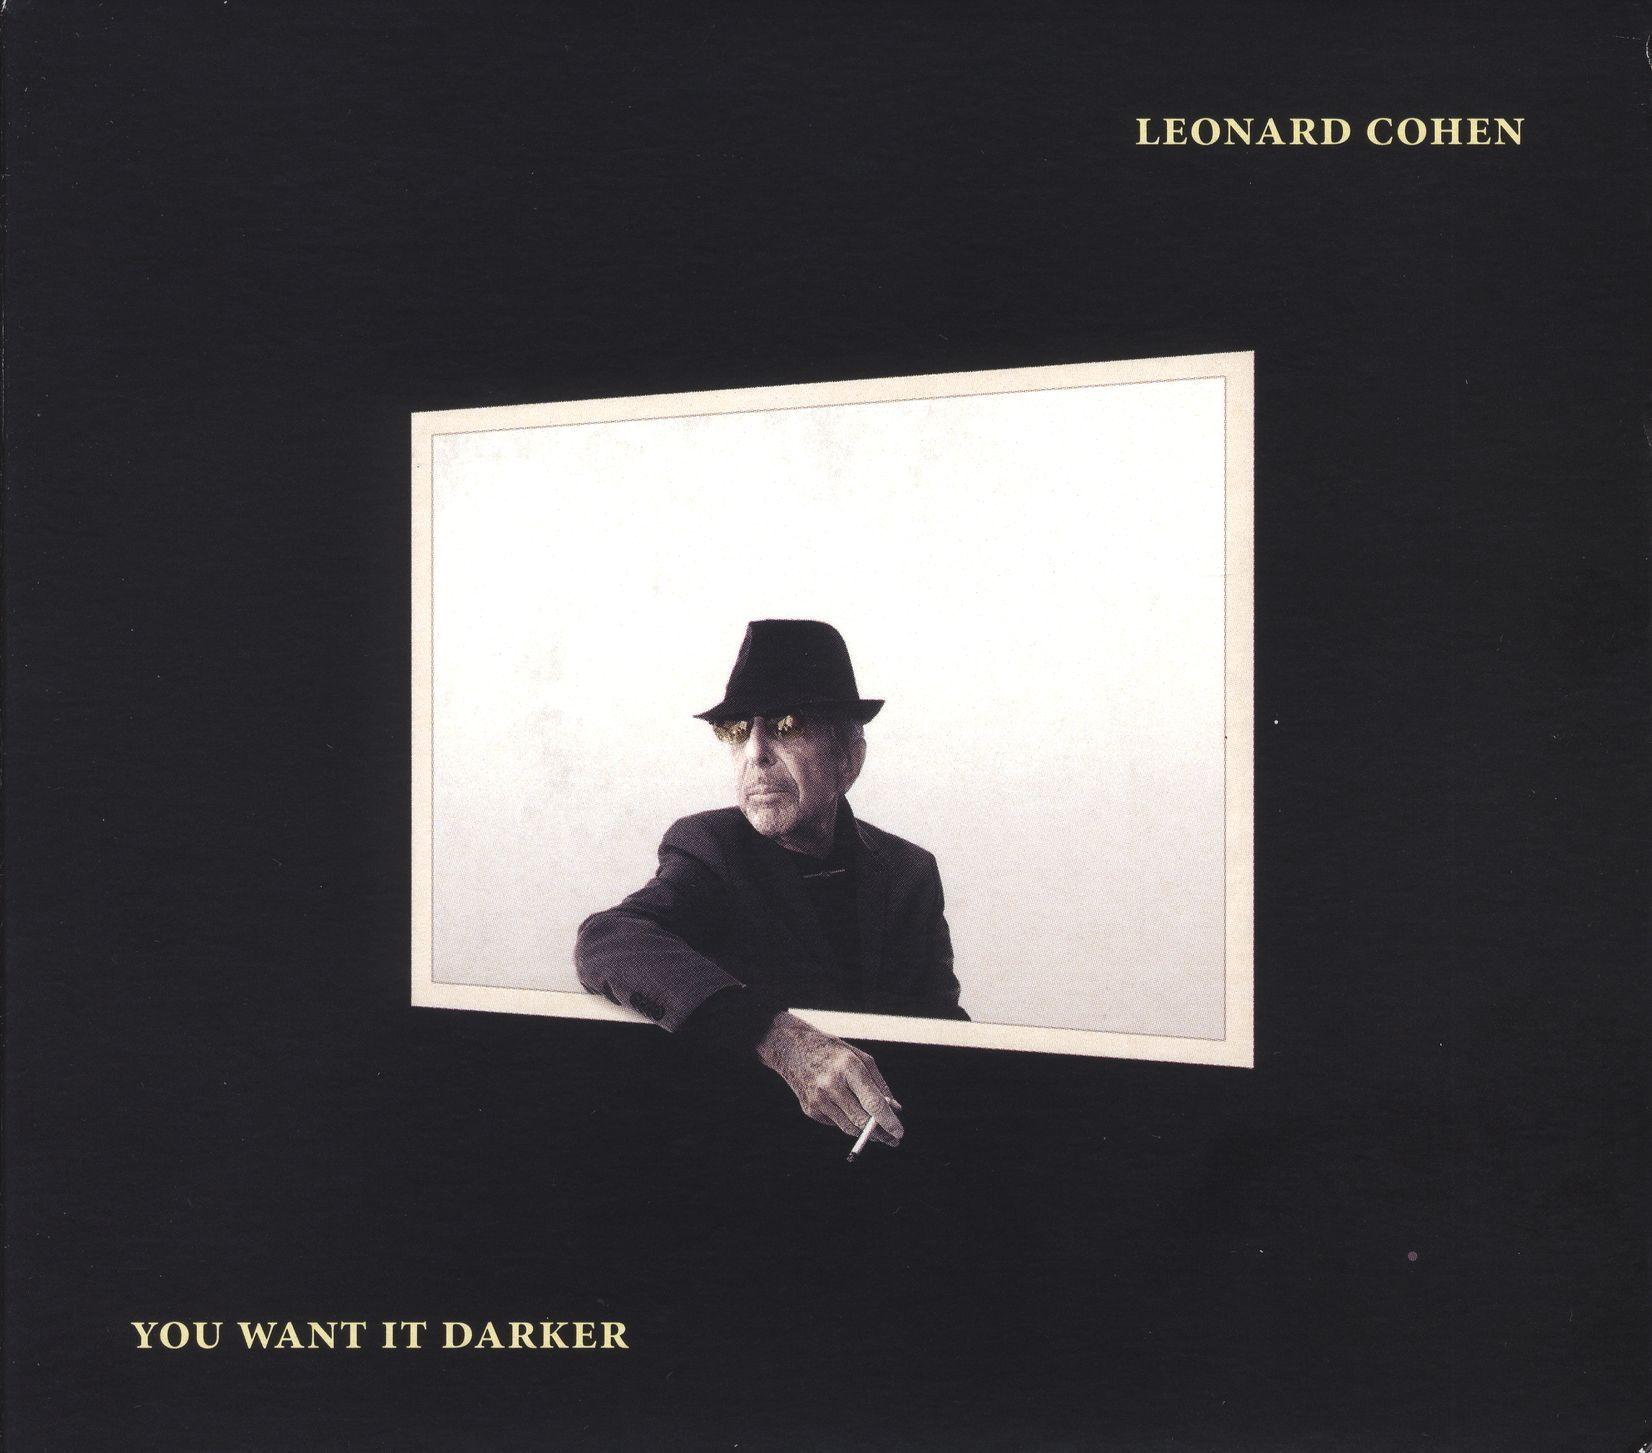 Leonard Cohen - You Want It Darker album cover